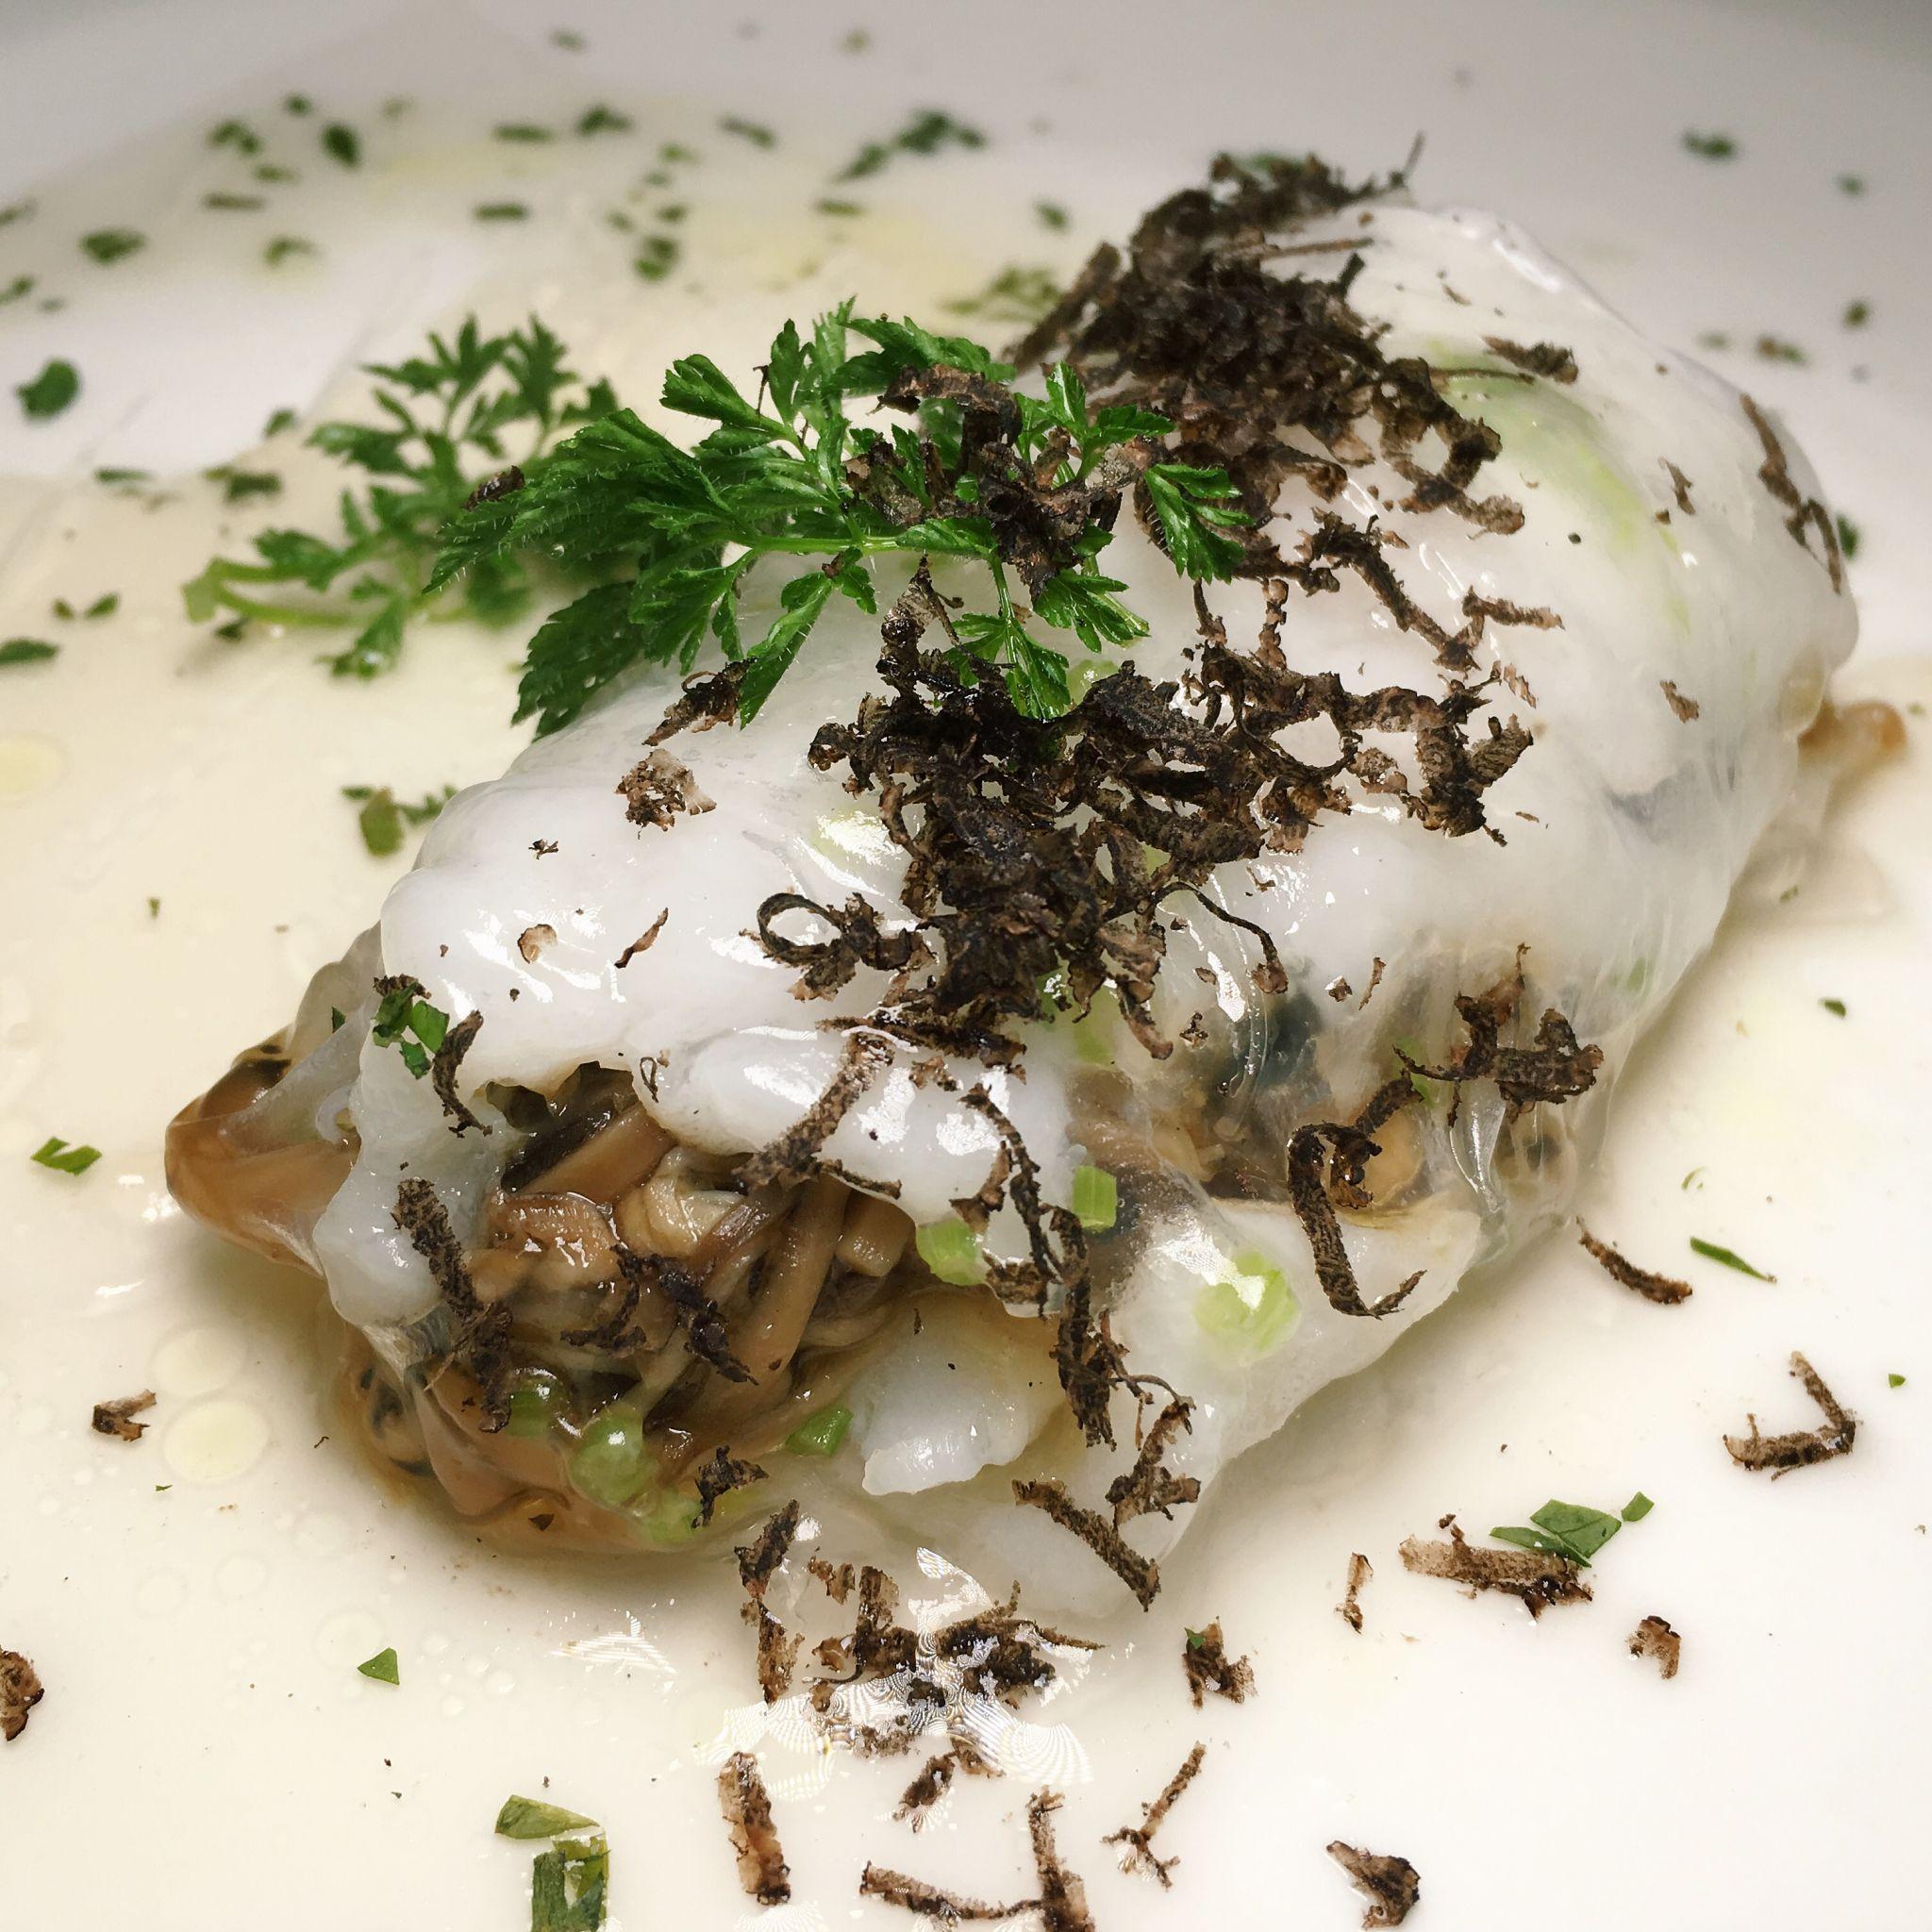 Steamed Cod in Paper Roll - Jiang-Nan Chun